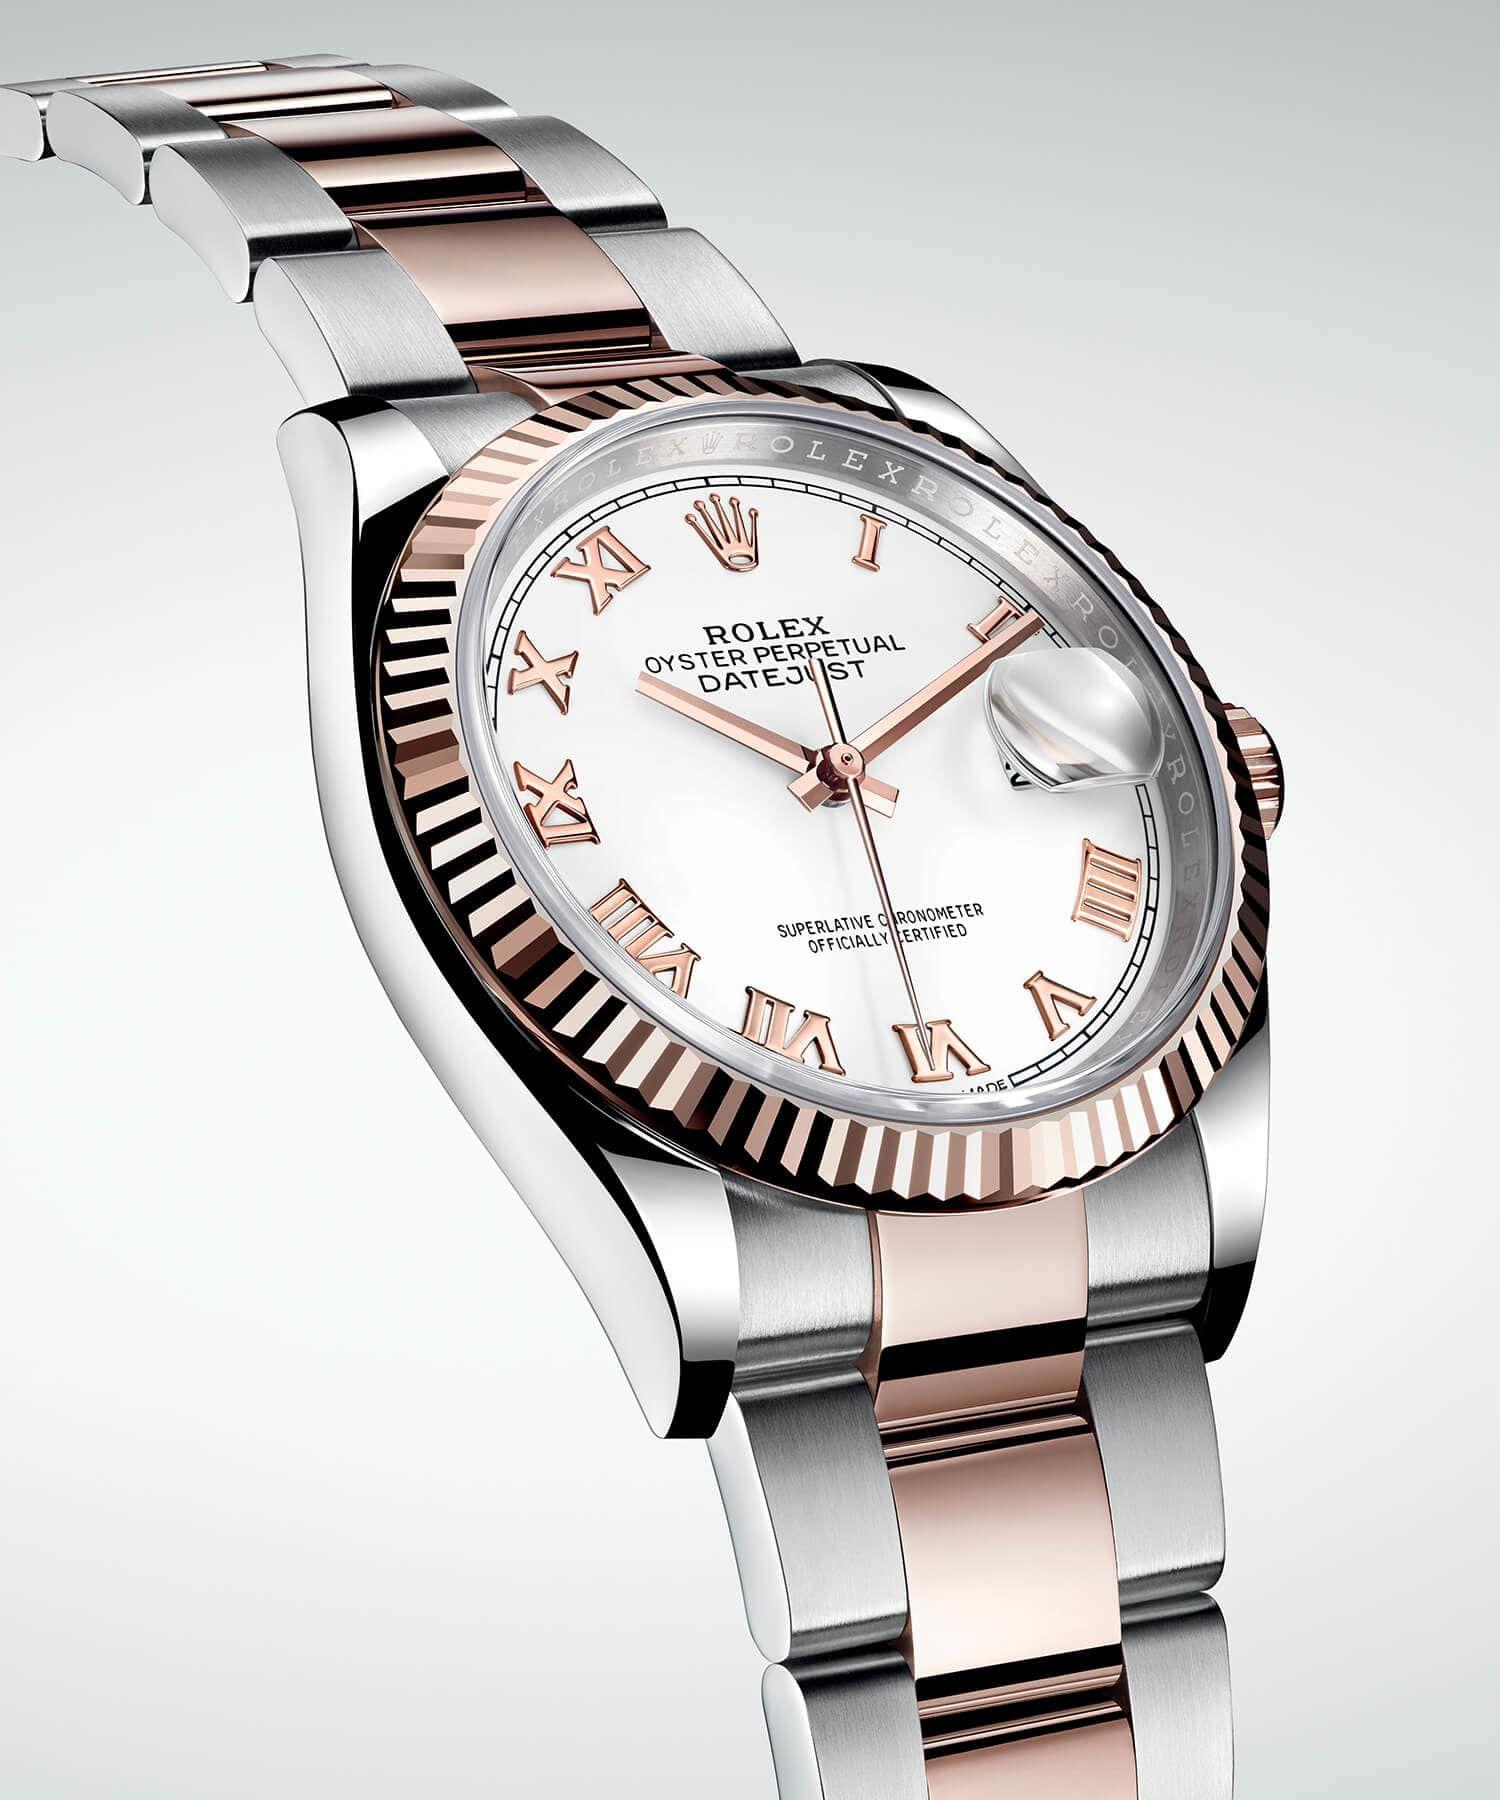 f3b4423e9a9 Novo relógio Rolex Datejust 36 - Baselworld 2018